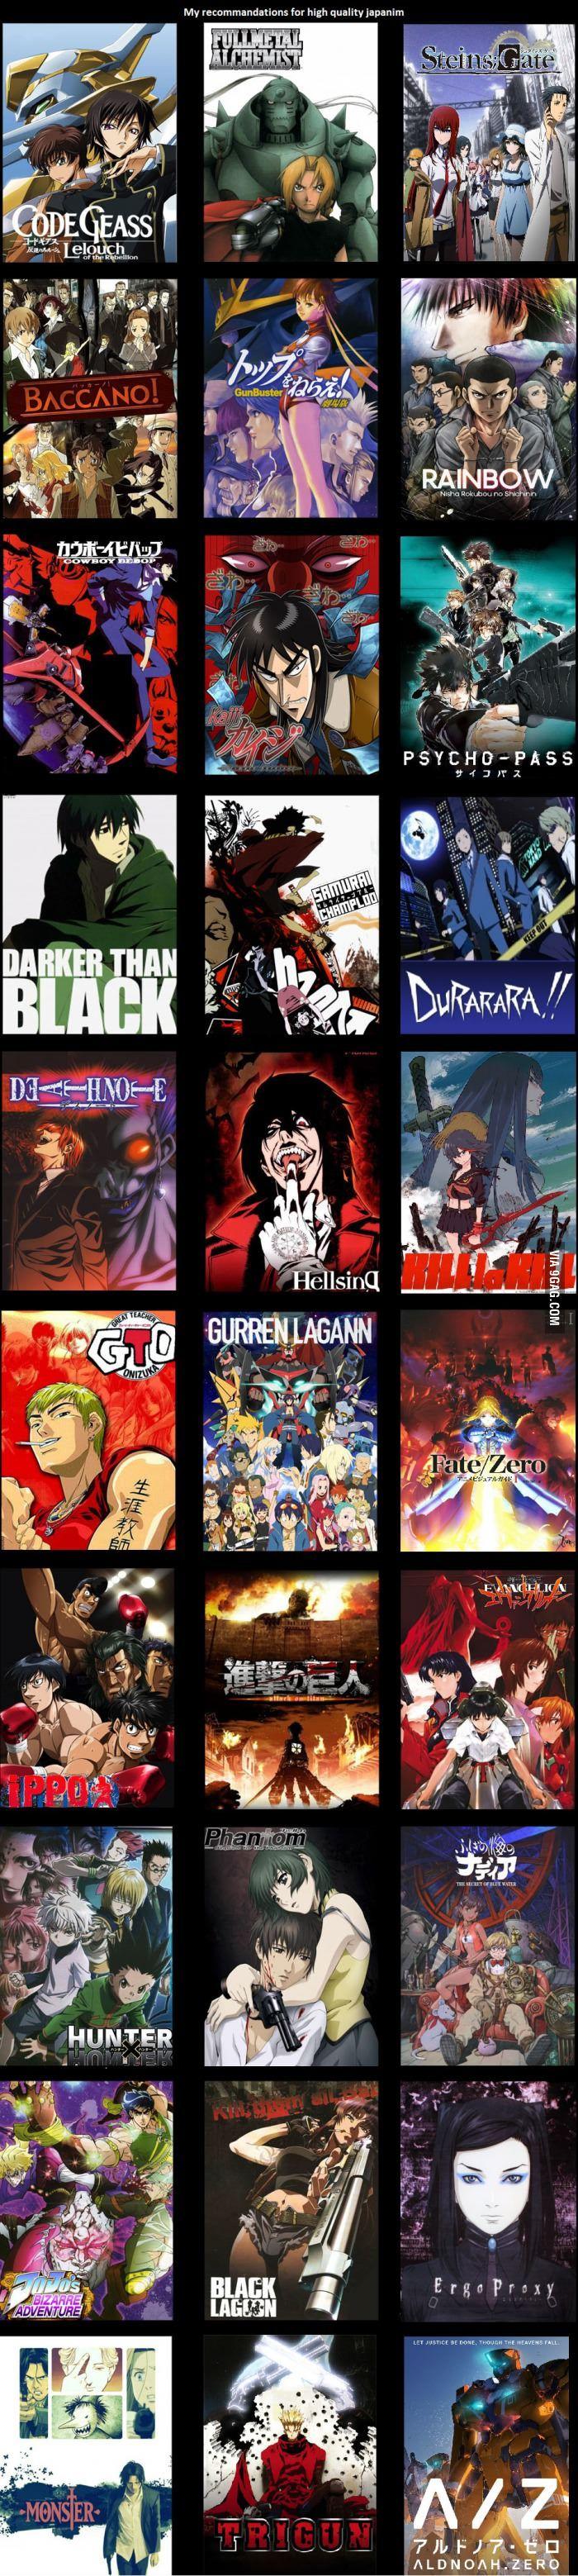 I Heard 9gag Wants More Anime Here Is A Subjective List Of Awsomeness